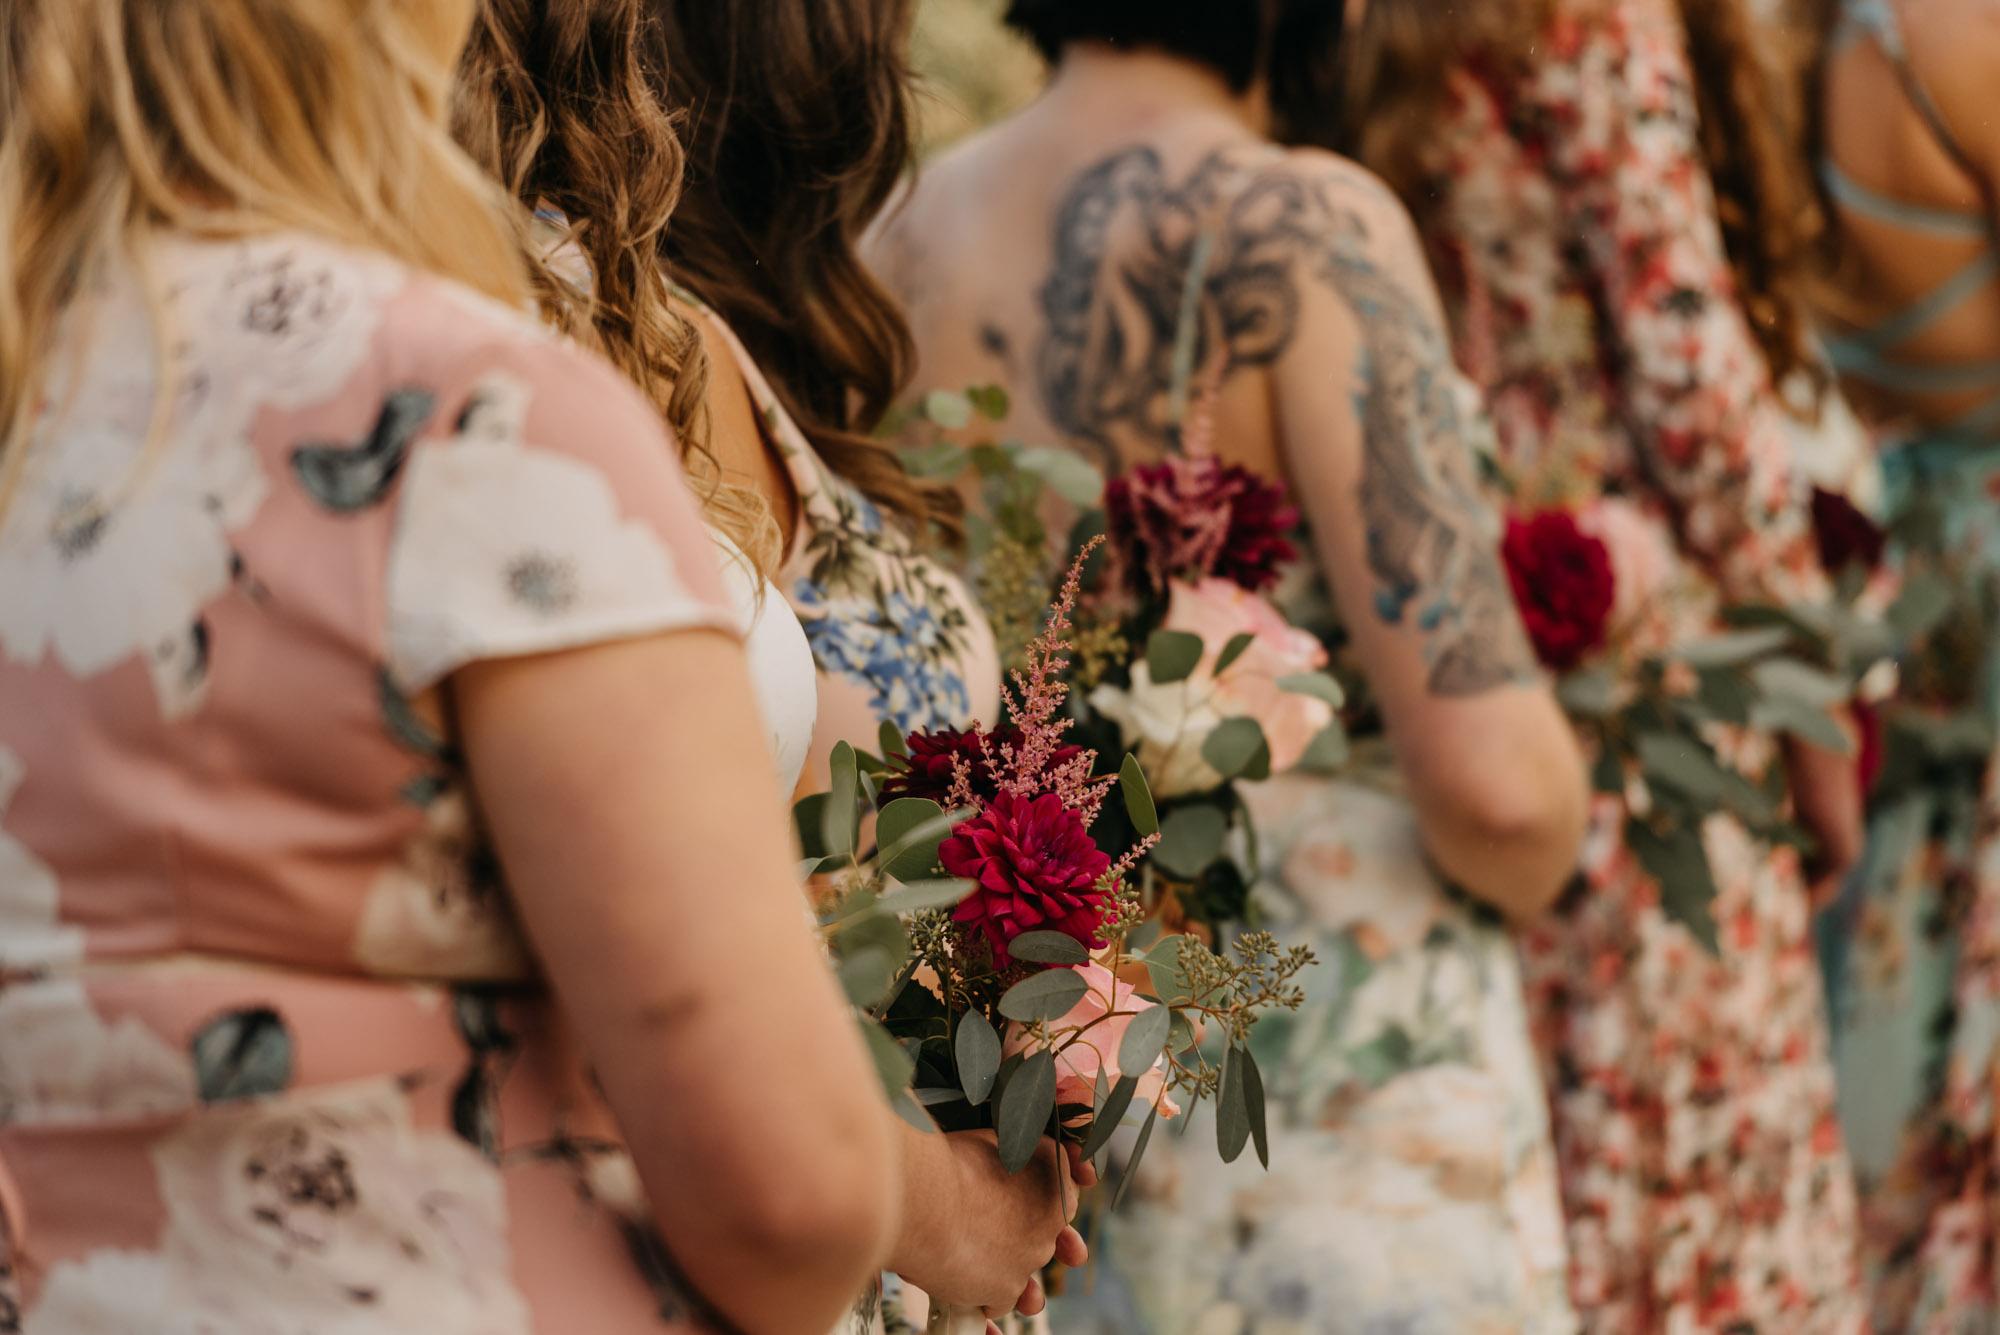 Outdoor-Summer-Ceremony-Washington-Wedding-Rainbow-8961.jpg